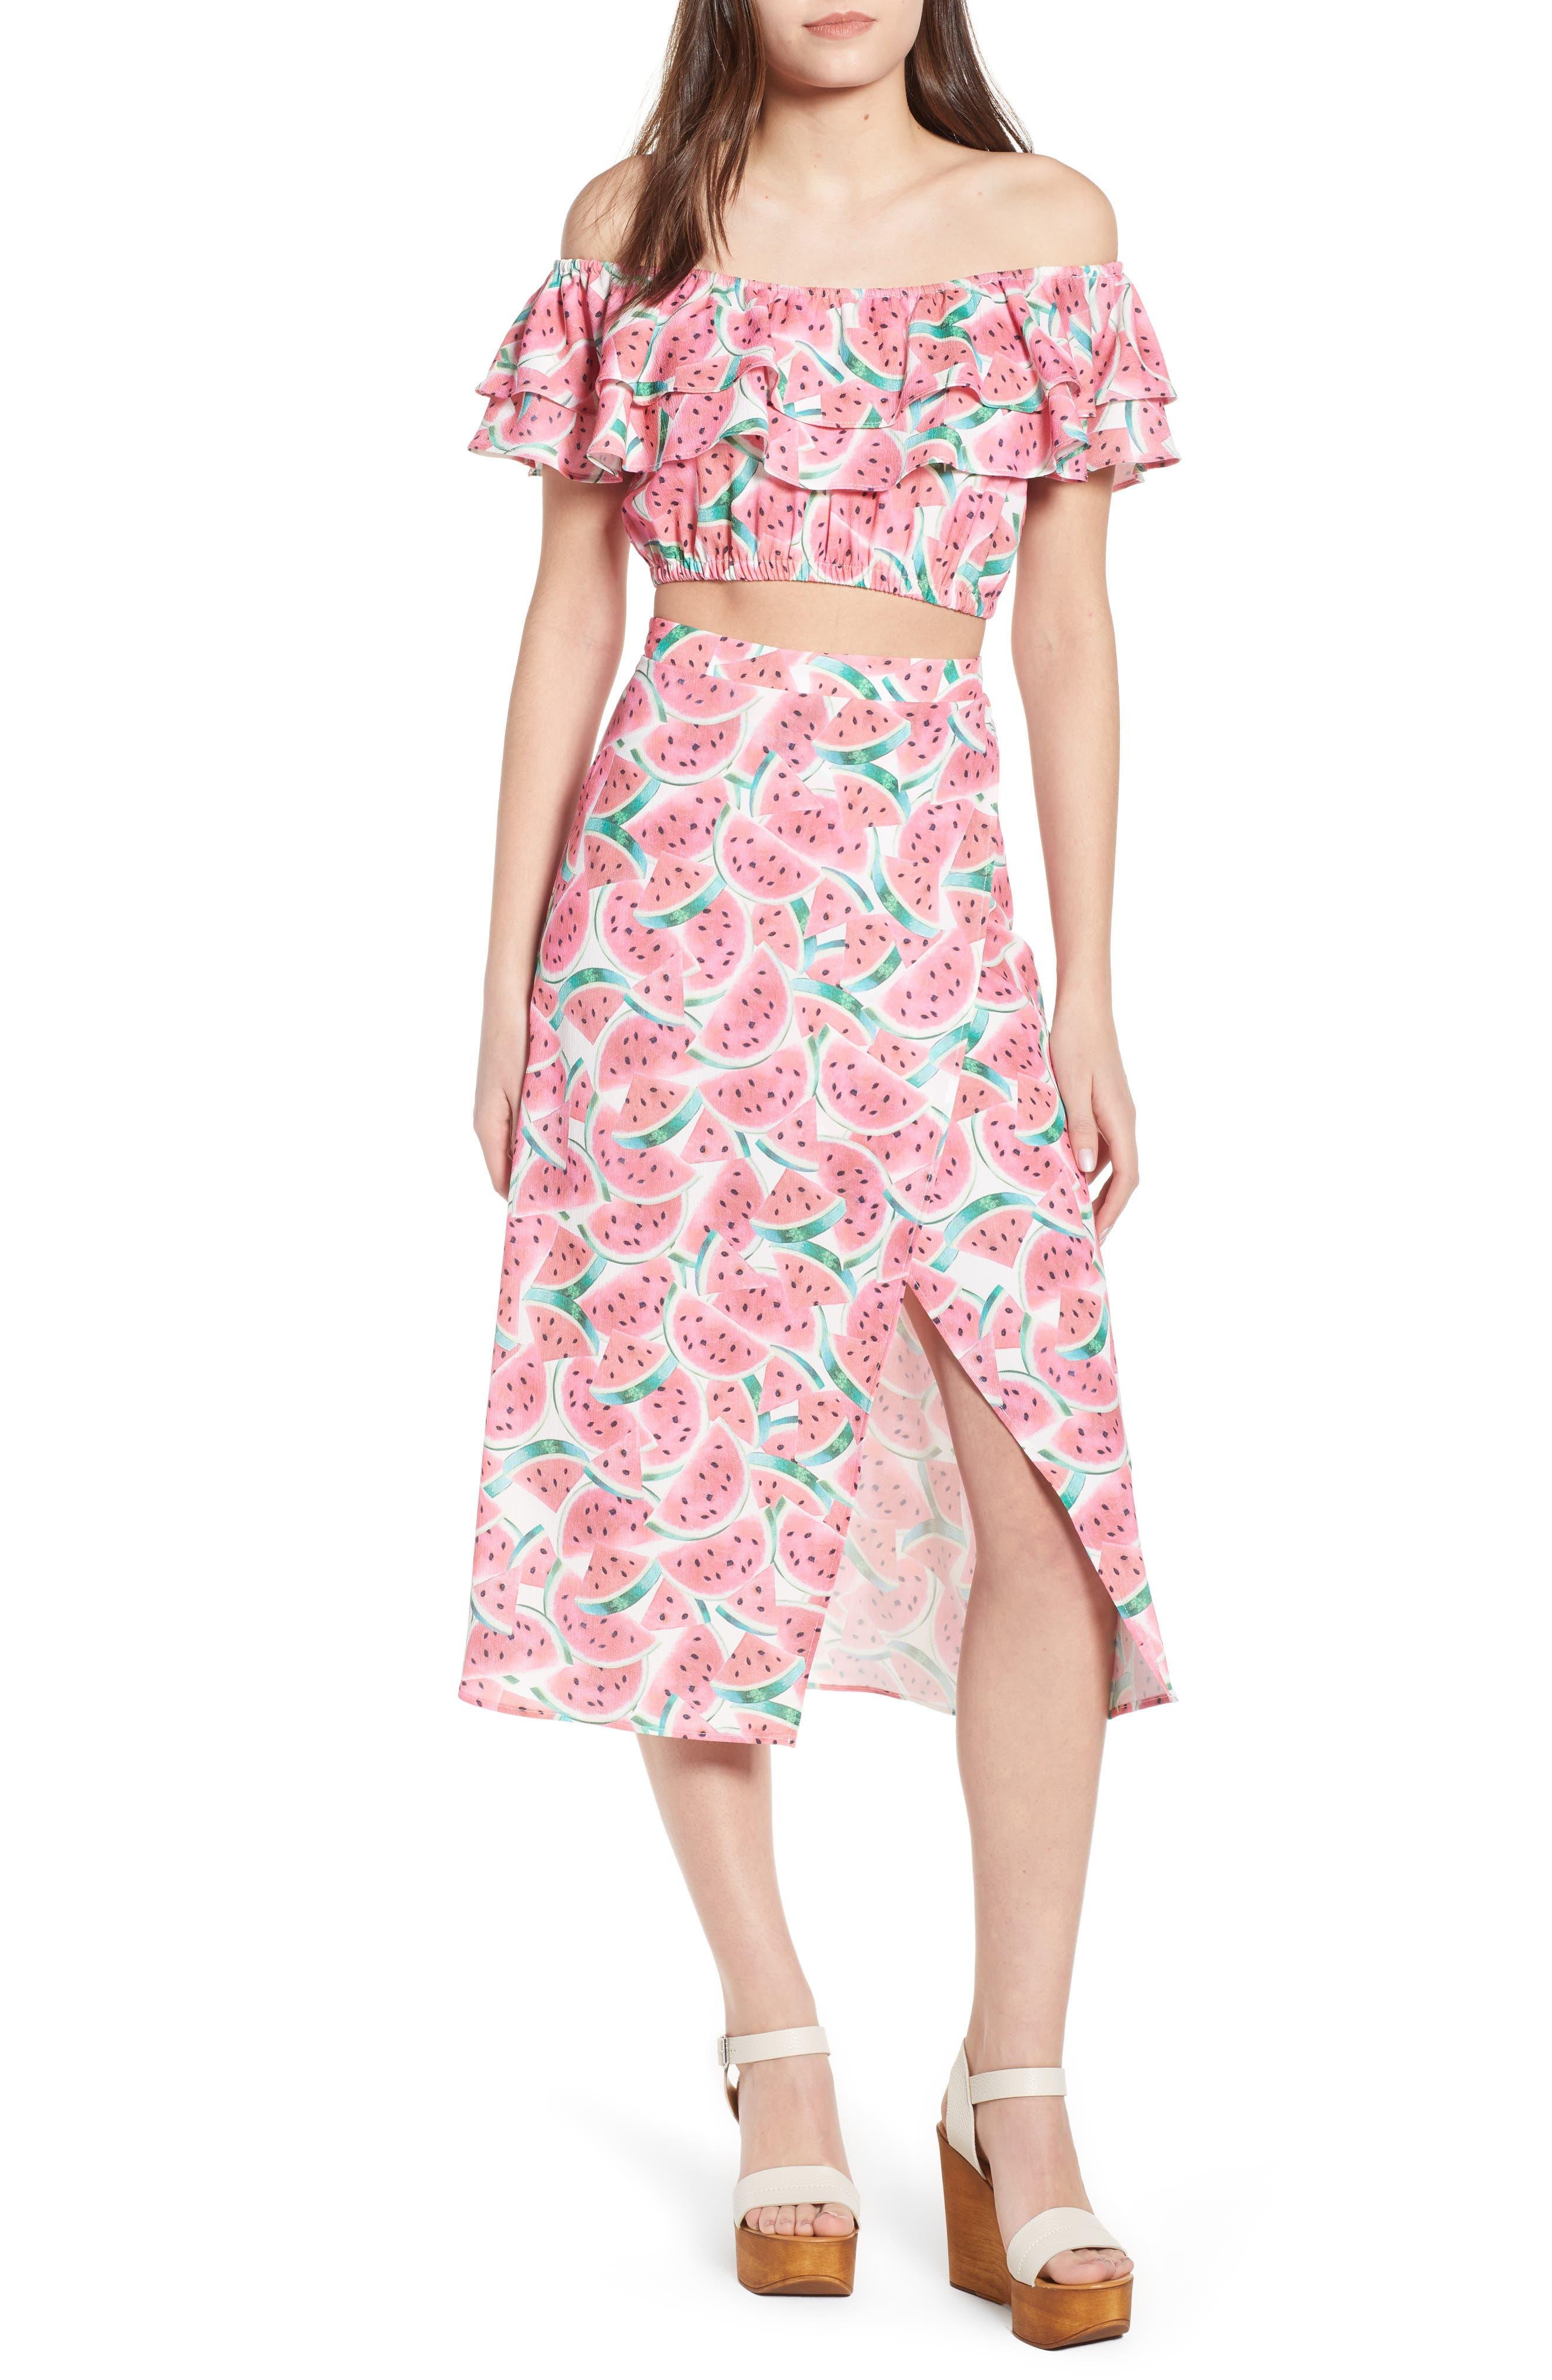 Flirt Midi Skirt,                             Alternate thumbnail 2, color,                             One In A Melon Crinkle Stretch